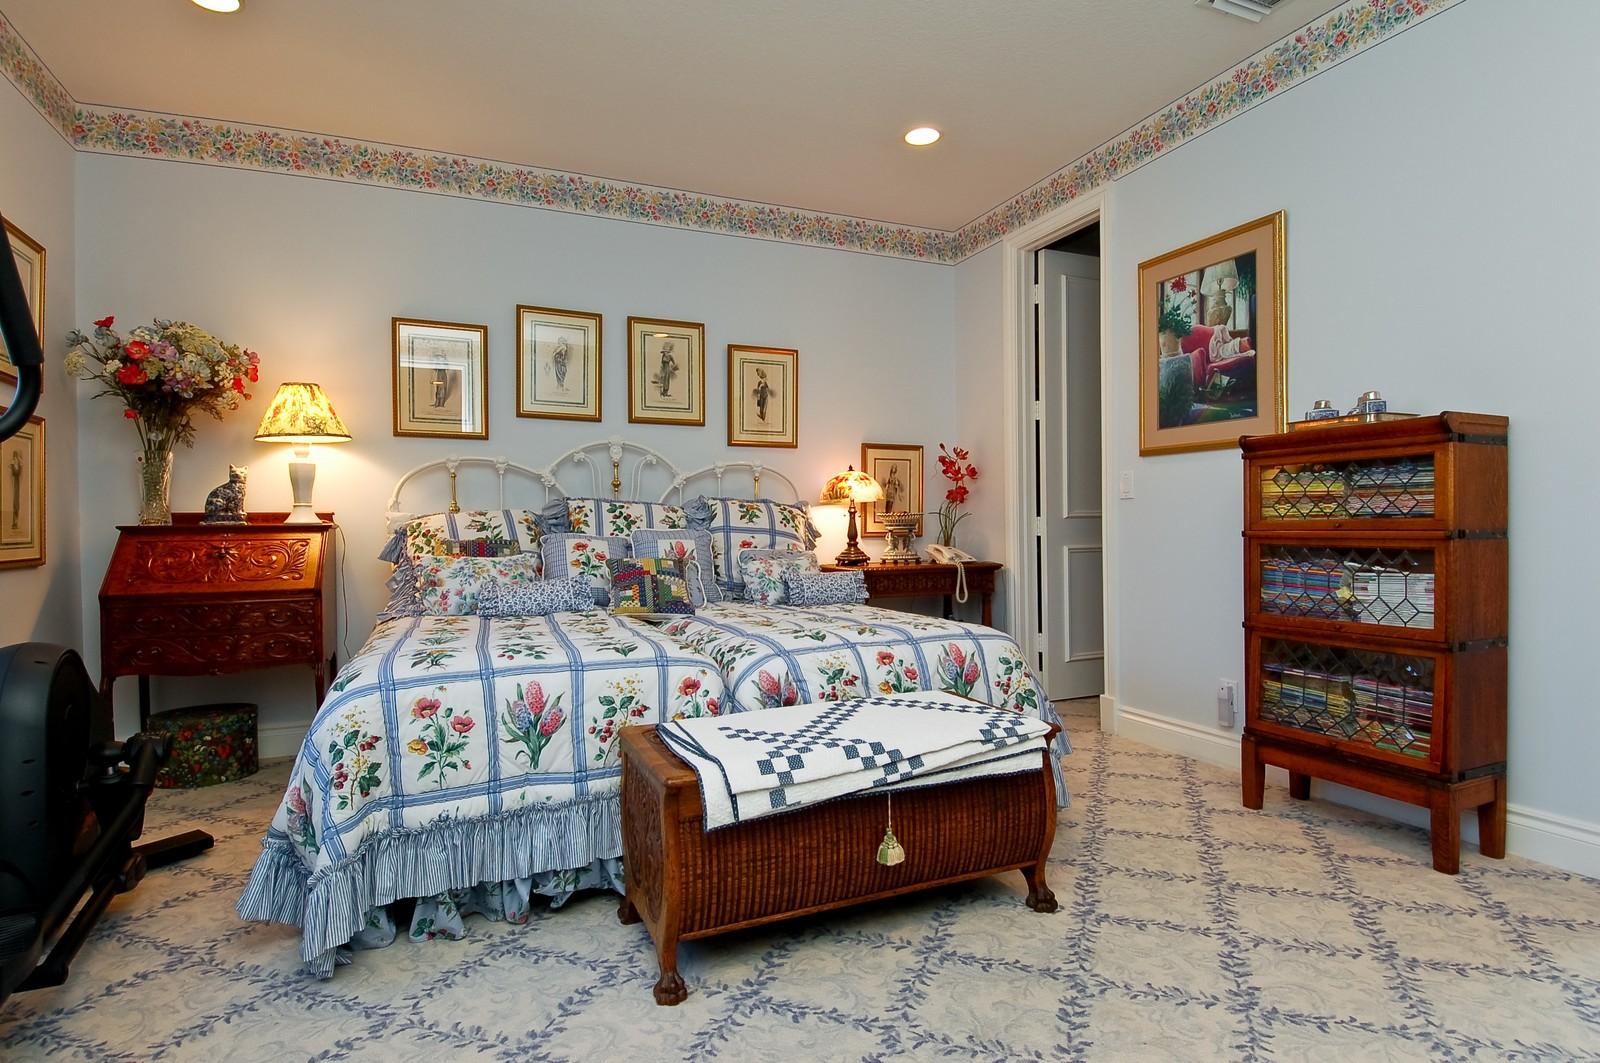 Real Estate Photography - 4252 Bocaire Blvd, Boca Raton, FL, 33487 - 3rd Bedroom